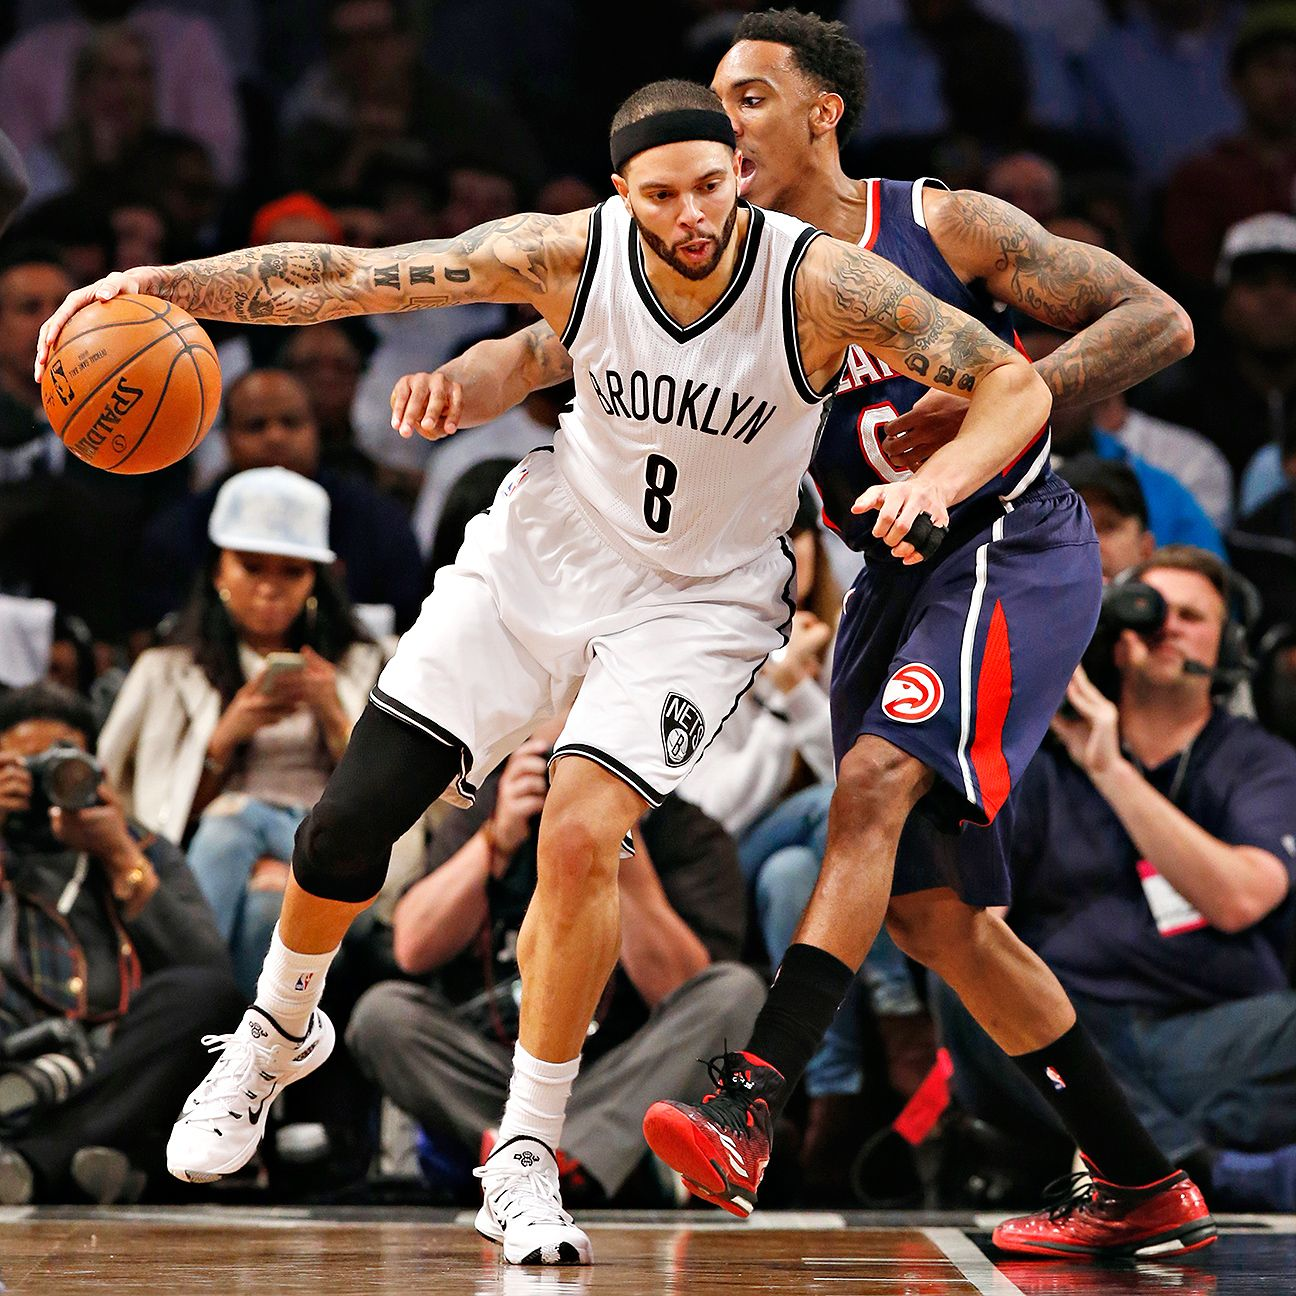 Nba Rumors And Basketball News: Bleacher Report Nba Trade Rumors